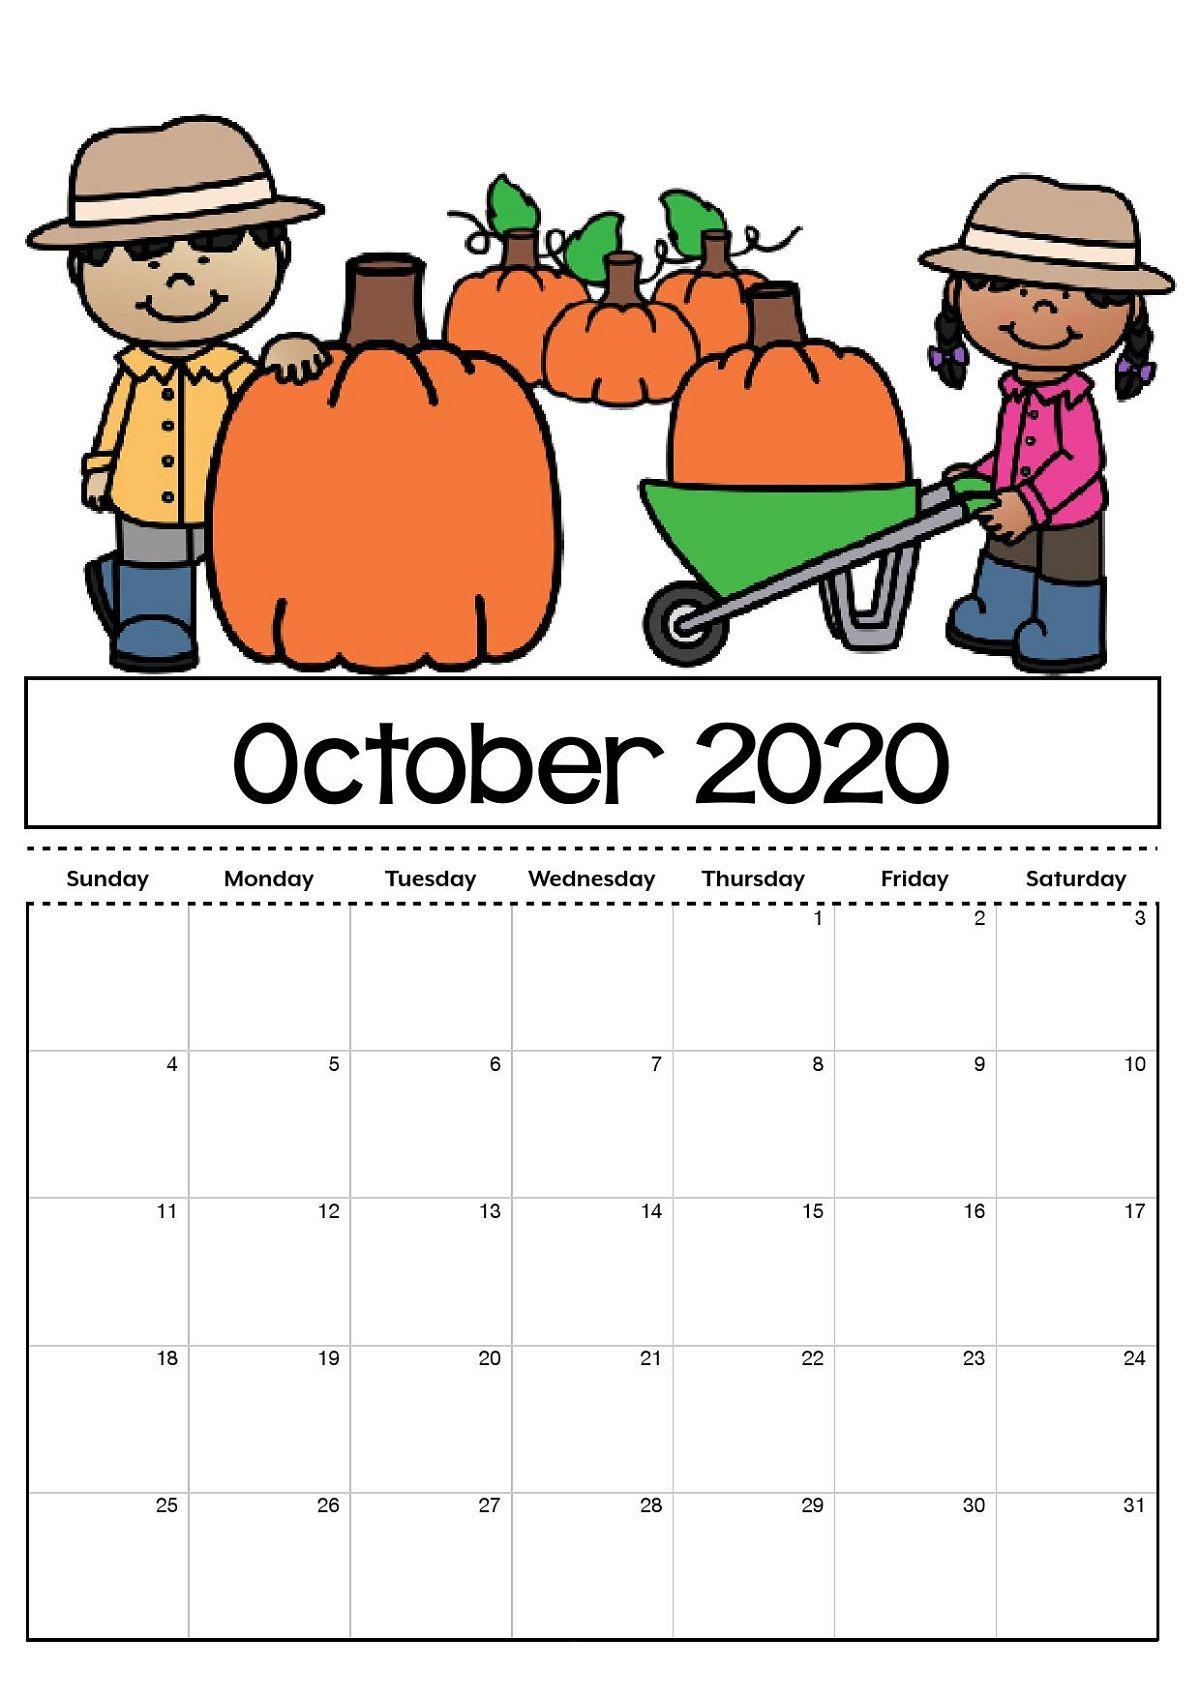 October 2020 Calendar for Kids in 2020 Kids calendar